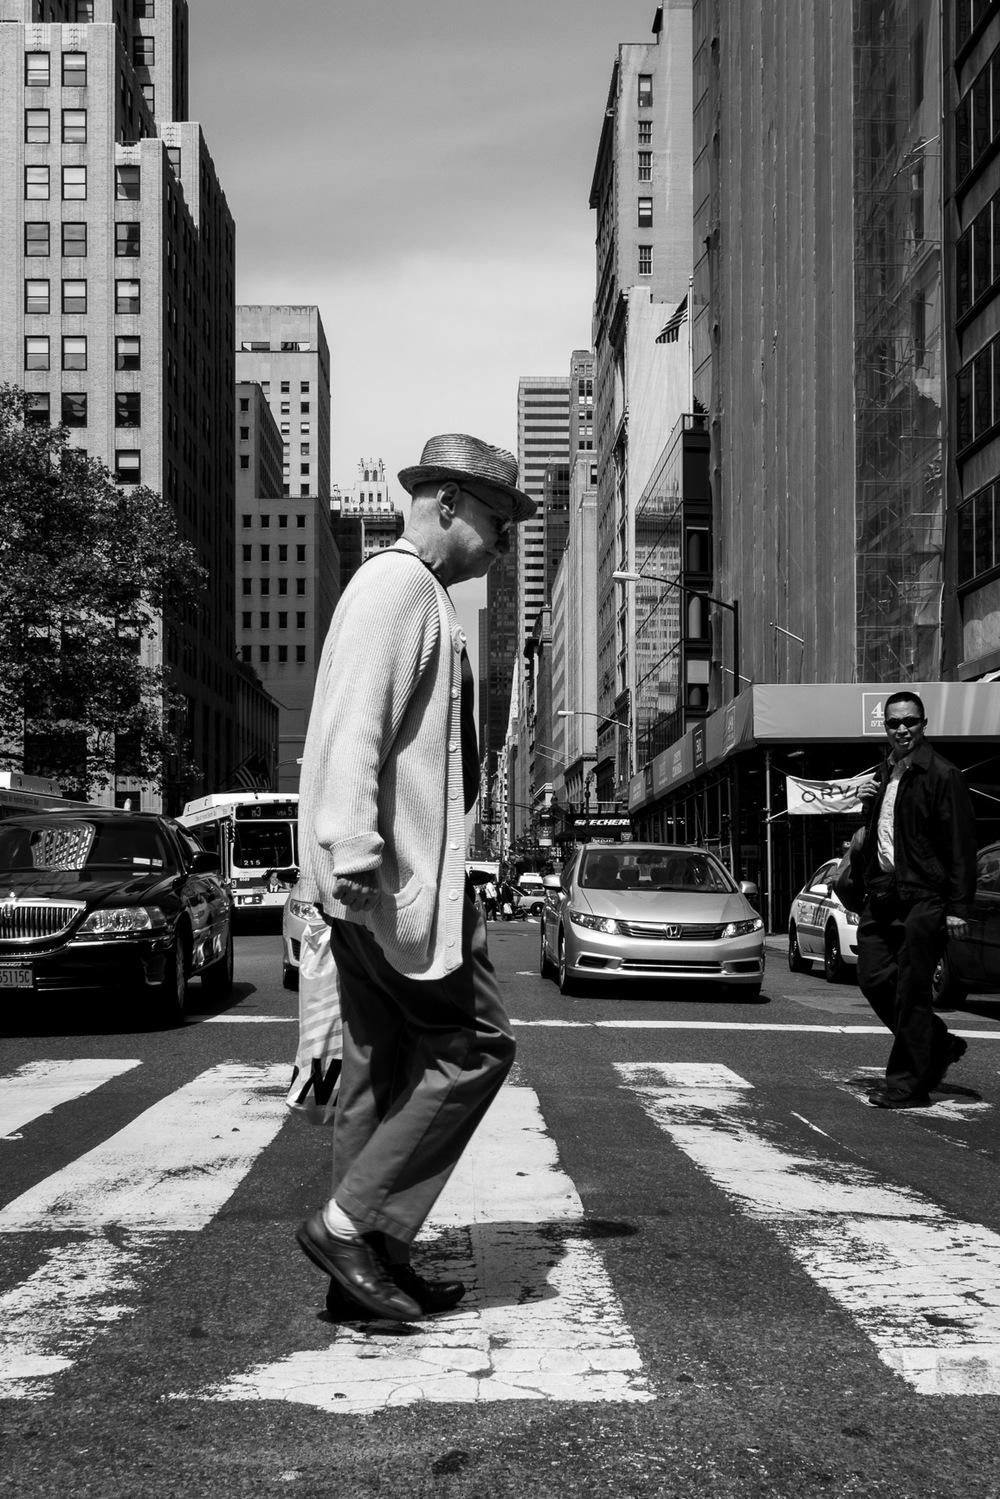 2015-05-14-NYC-0325.jpg